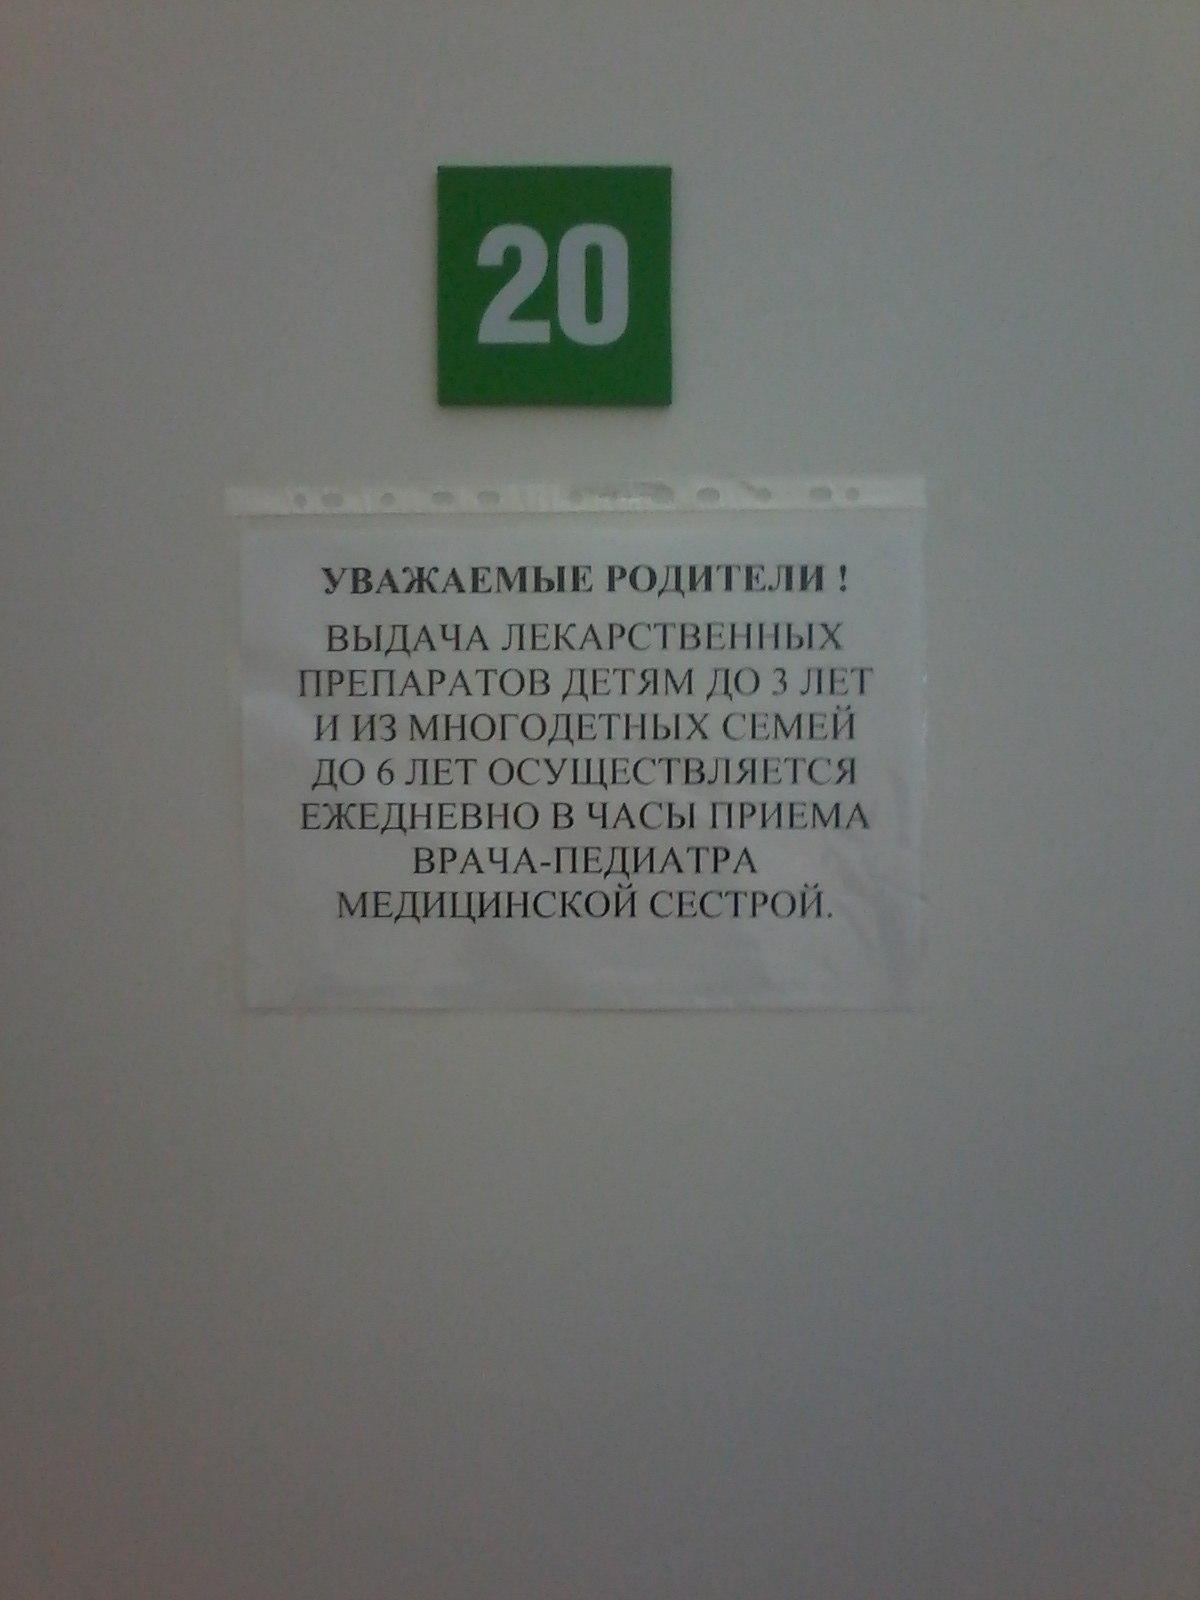 1й медицинский центр